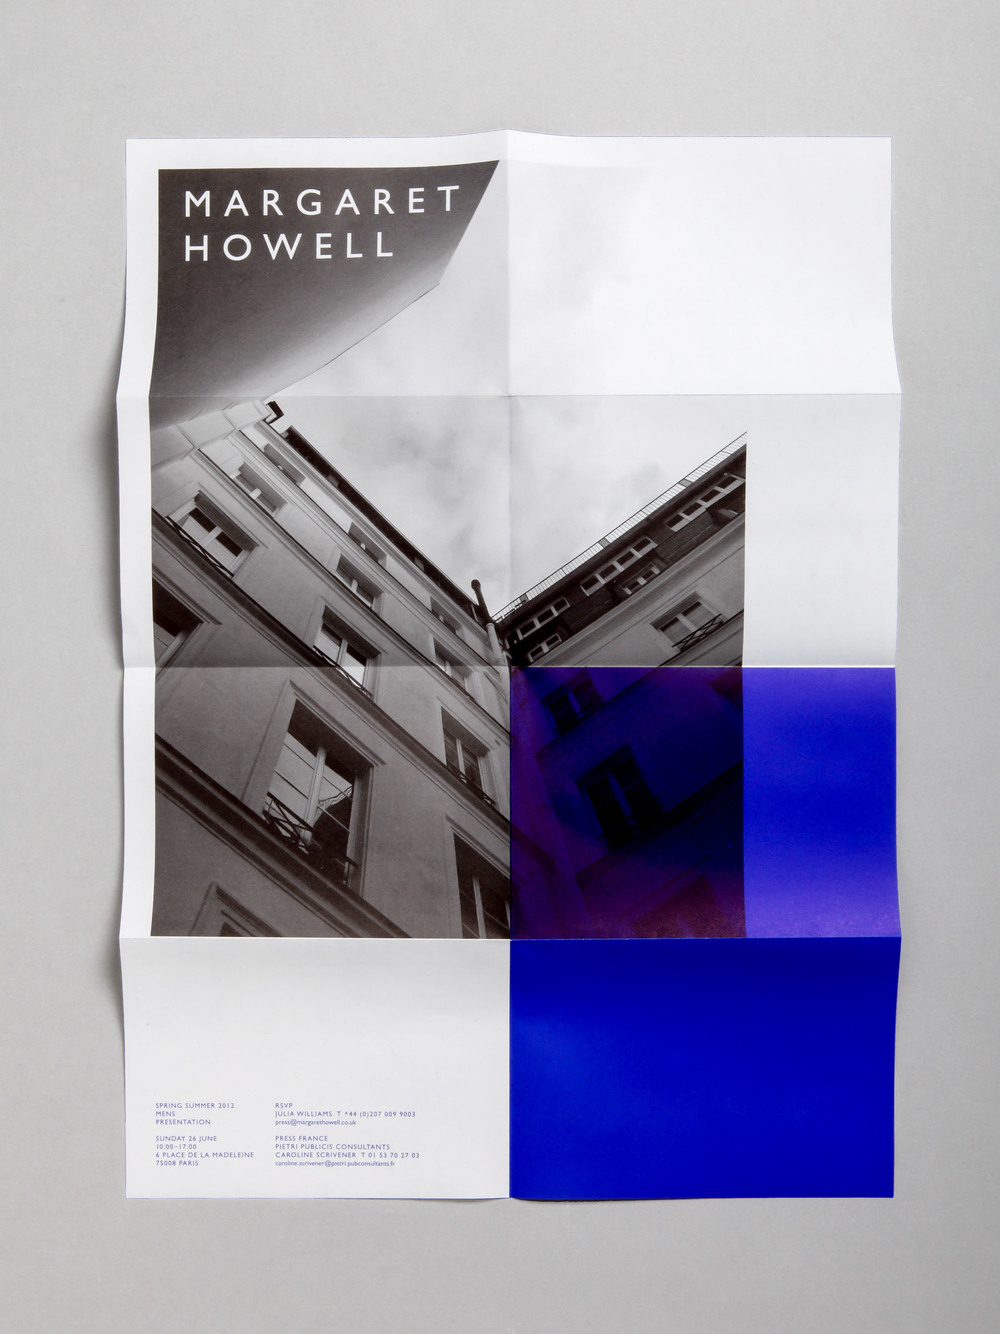 together-associates-studiosmall-margaret-howell-20.jpg